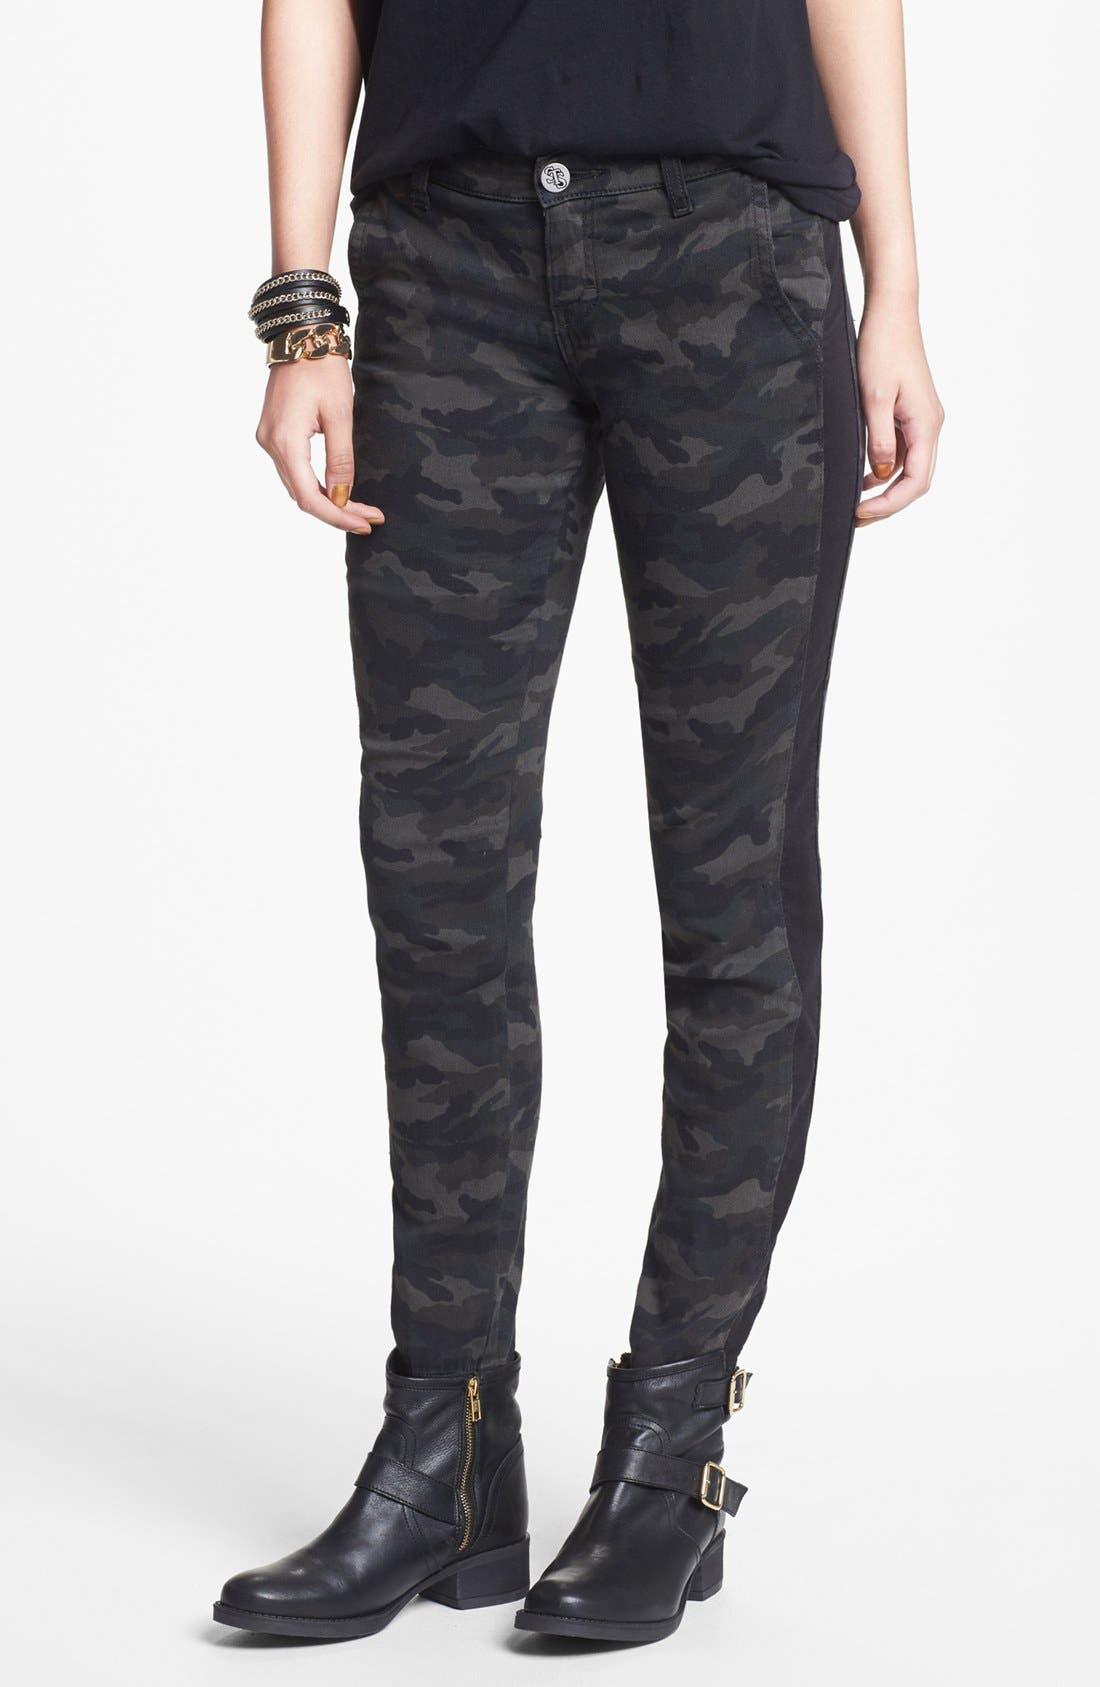 Main Image - STS Blue Tuxedo Stripe Camo Print Pants (Juniors)